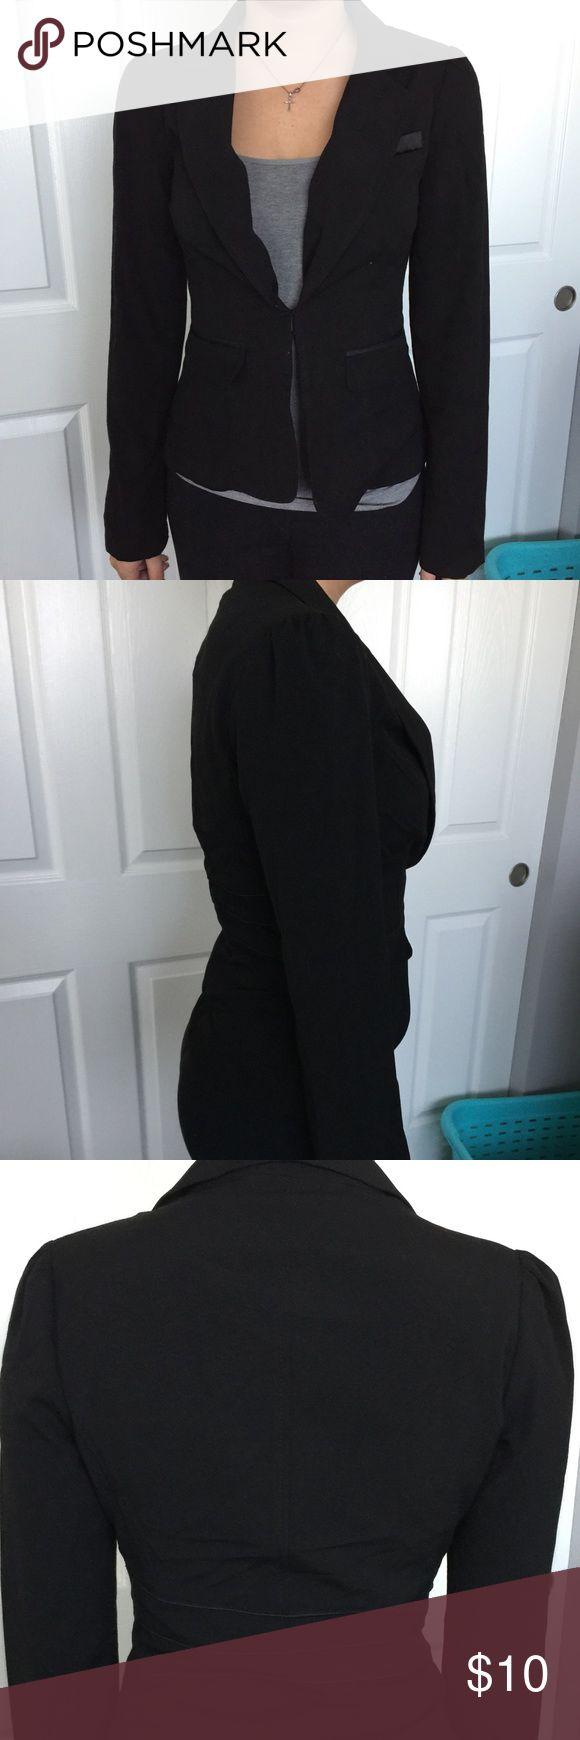 Small Papaya Black Suit Blazer Jacket -- adorable! Adorable black suit blazer jacket from papaya! 10% off all bundles! I accept offers so please use the offer button! 💙 Papaya Jackets & Coats